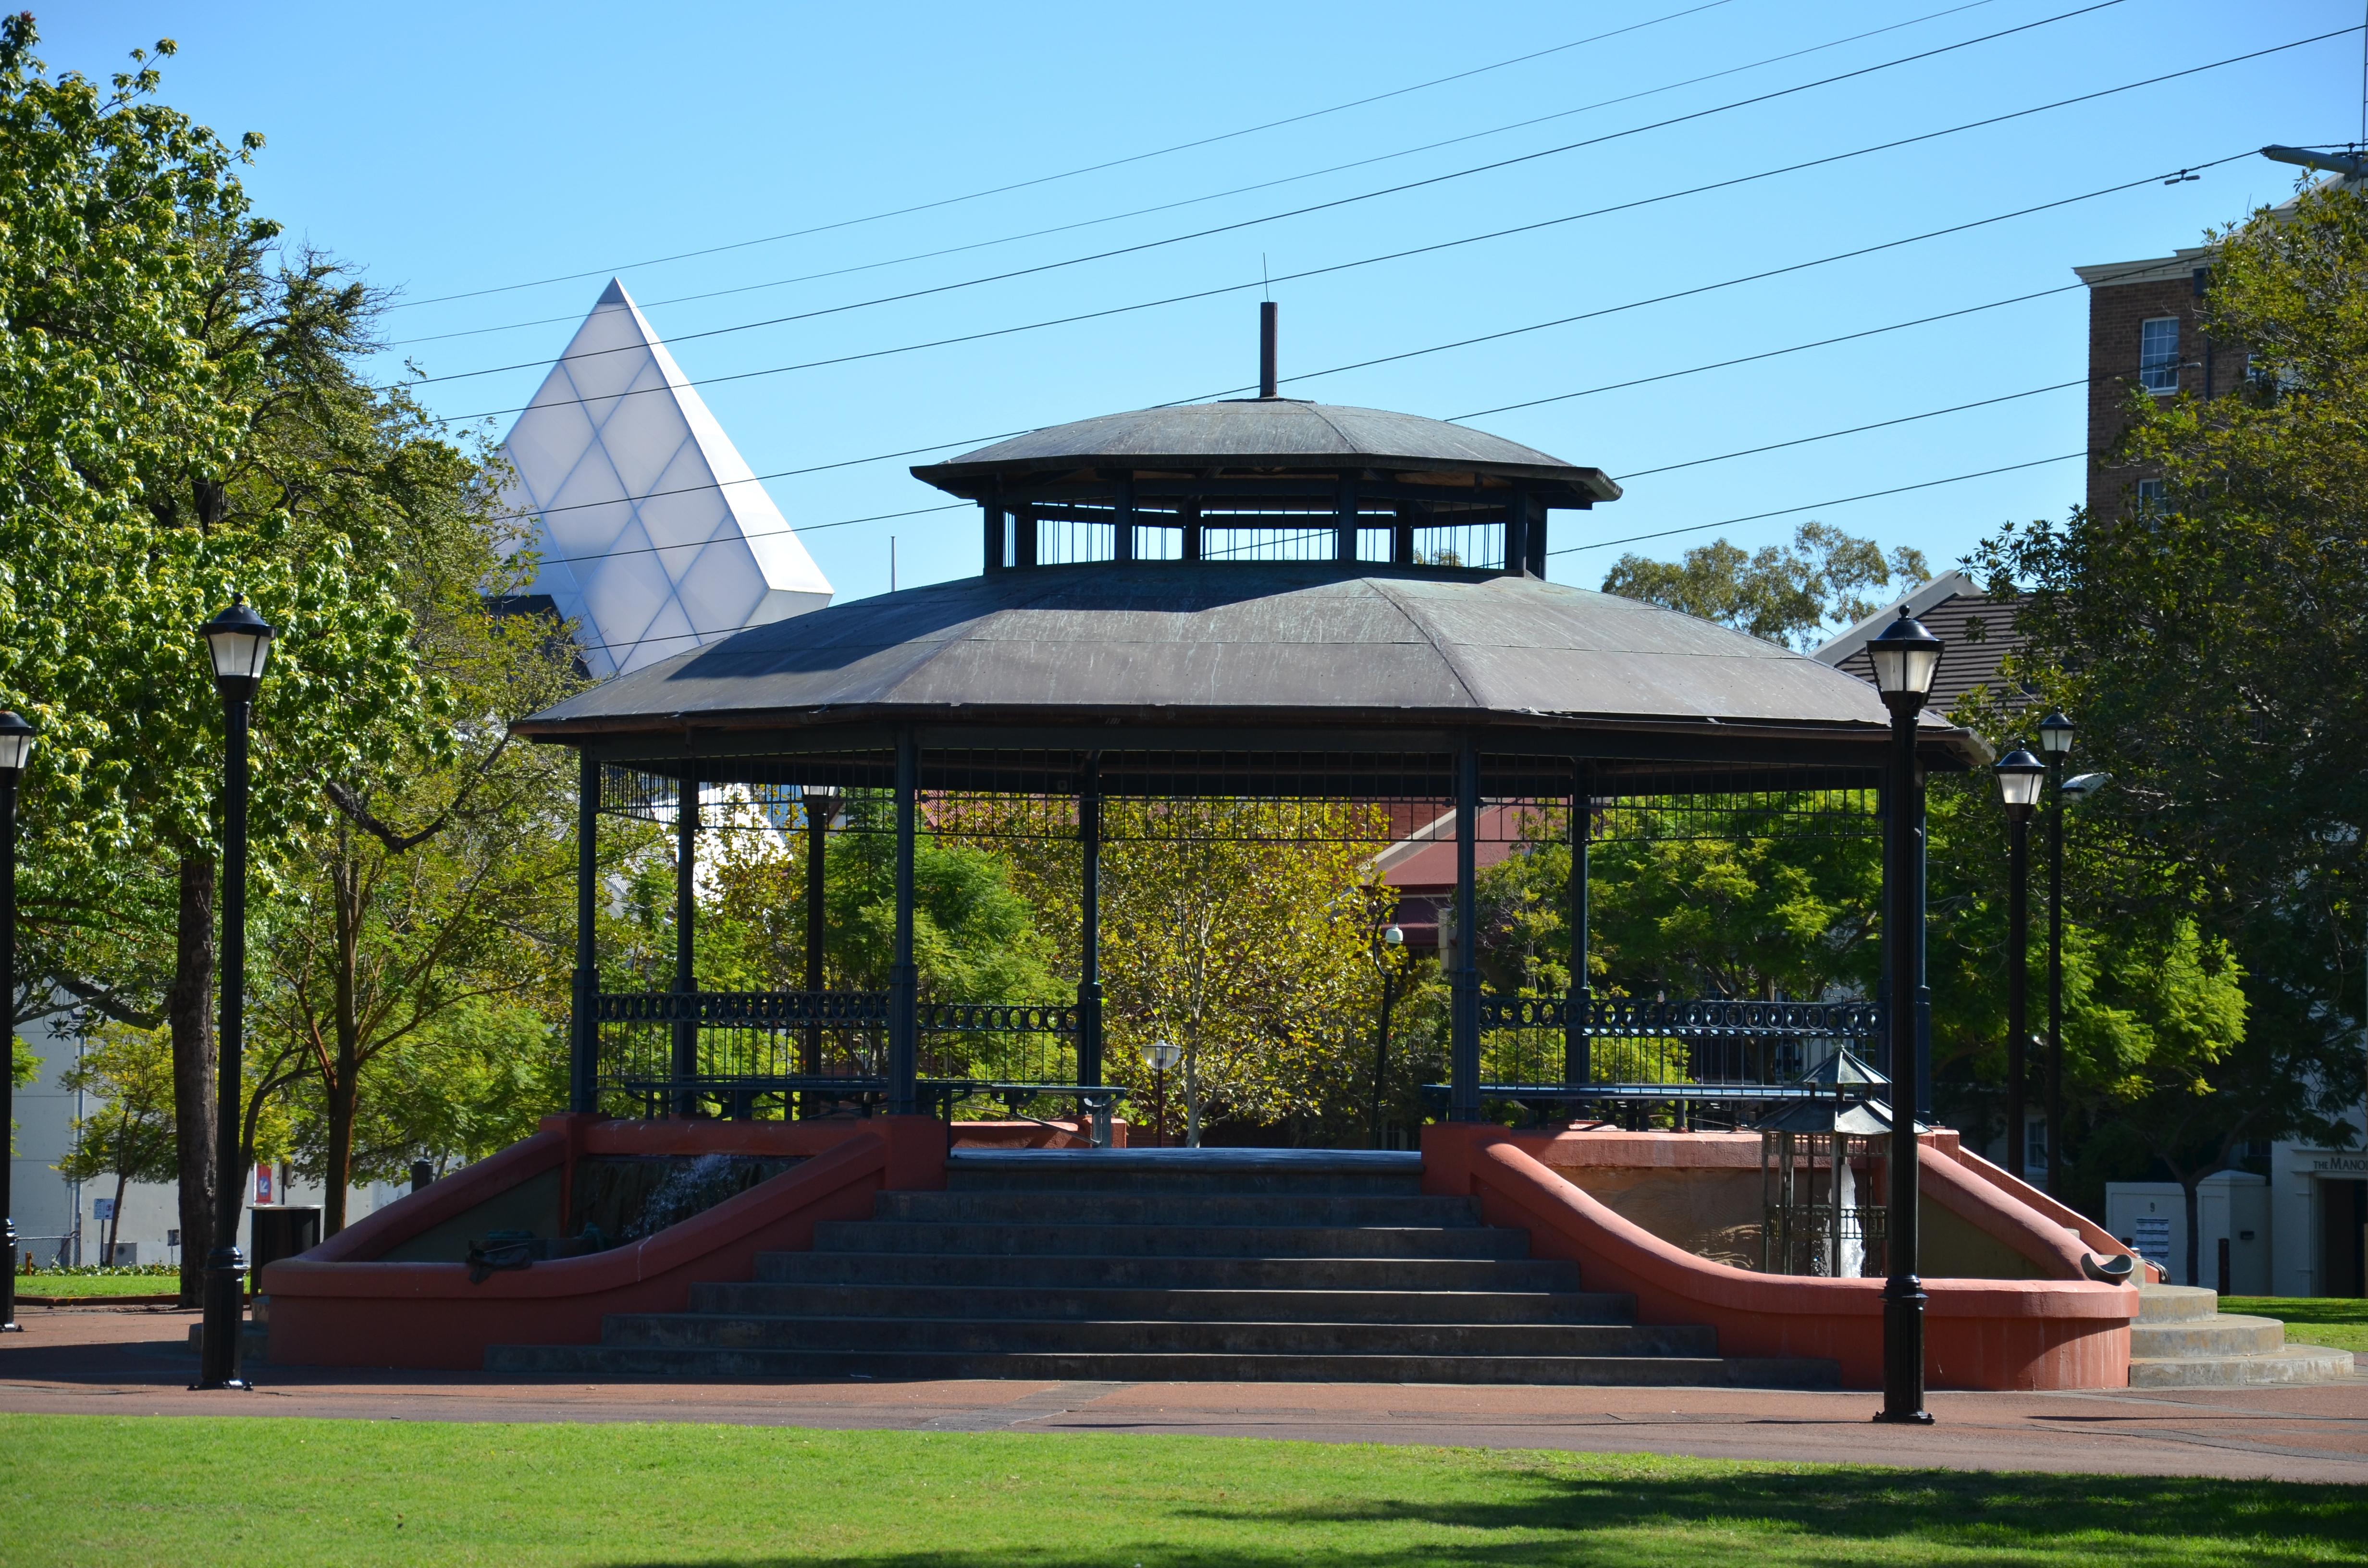 Between dates in Perth